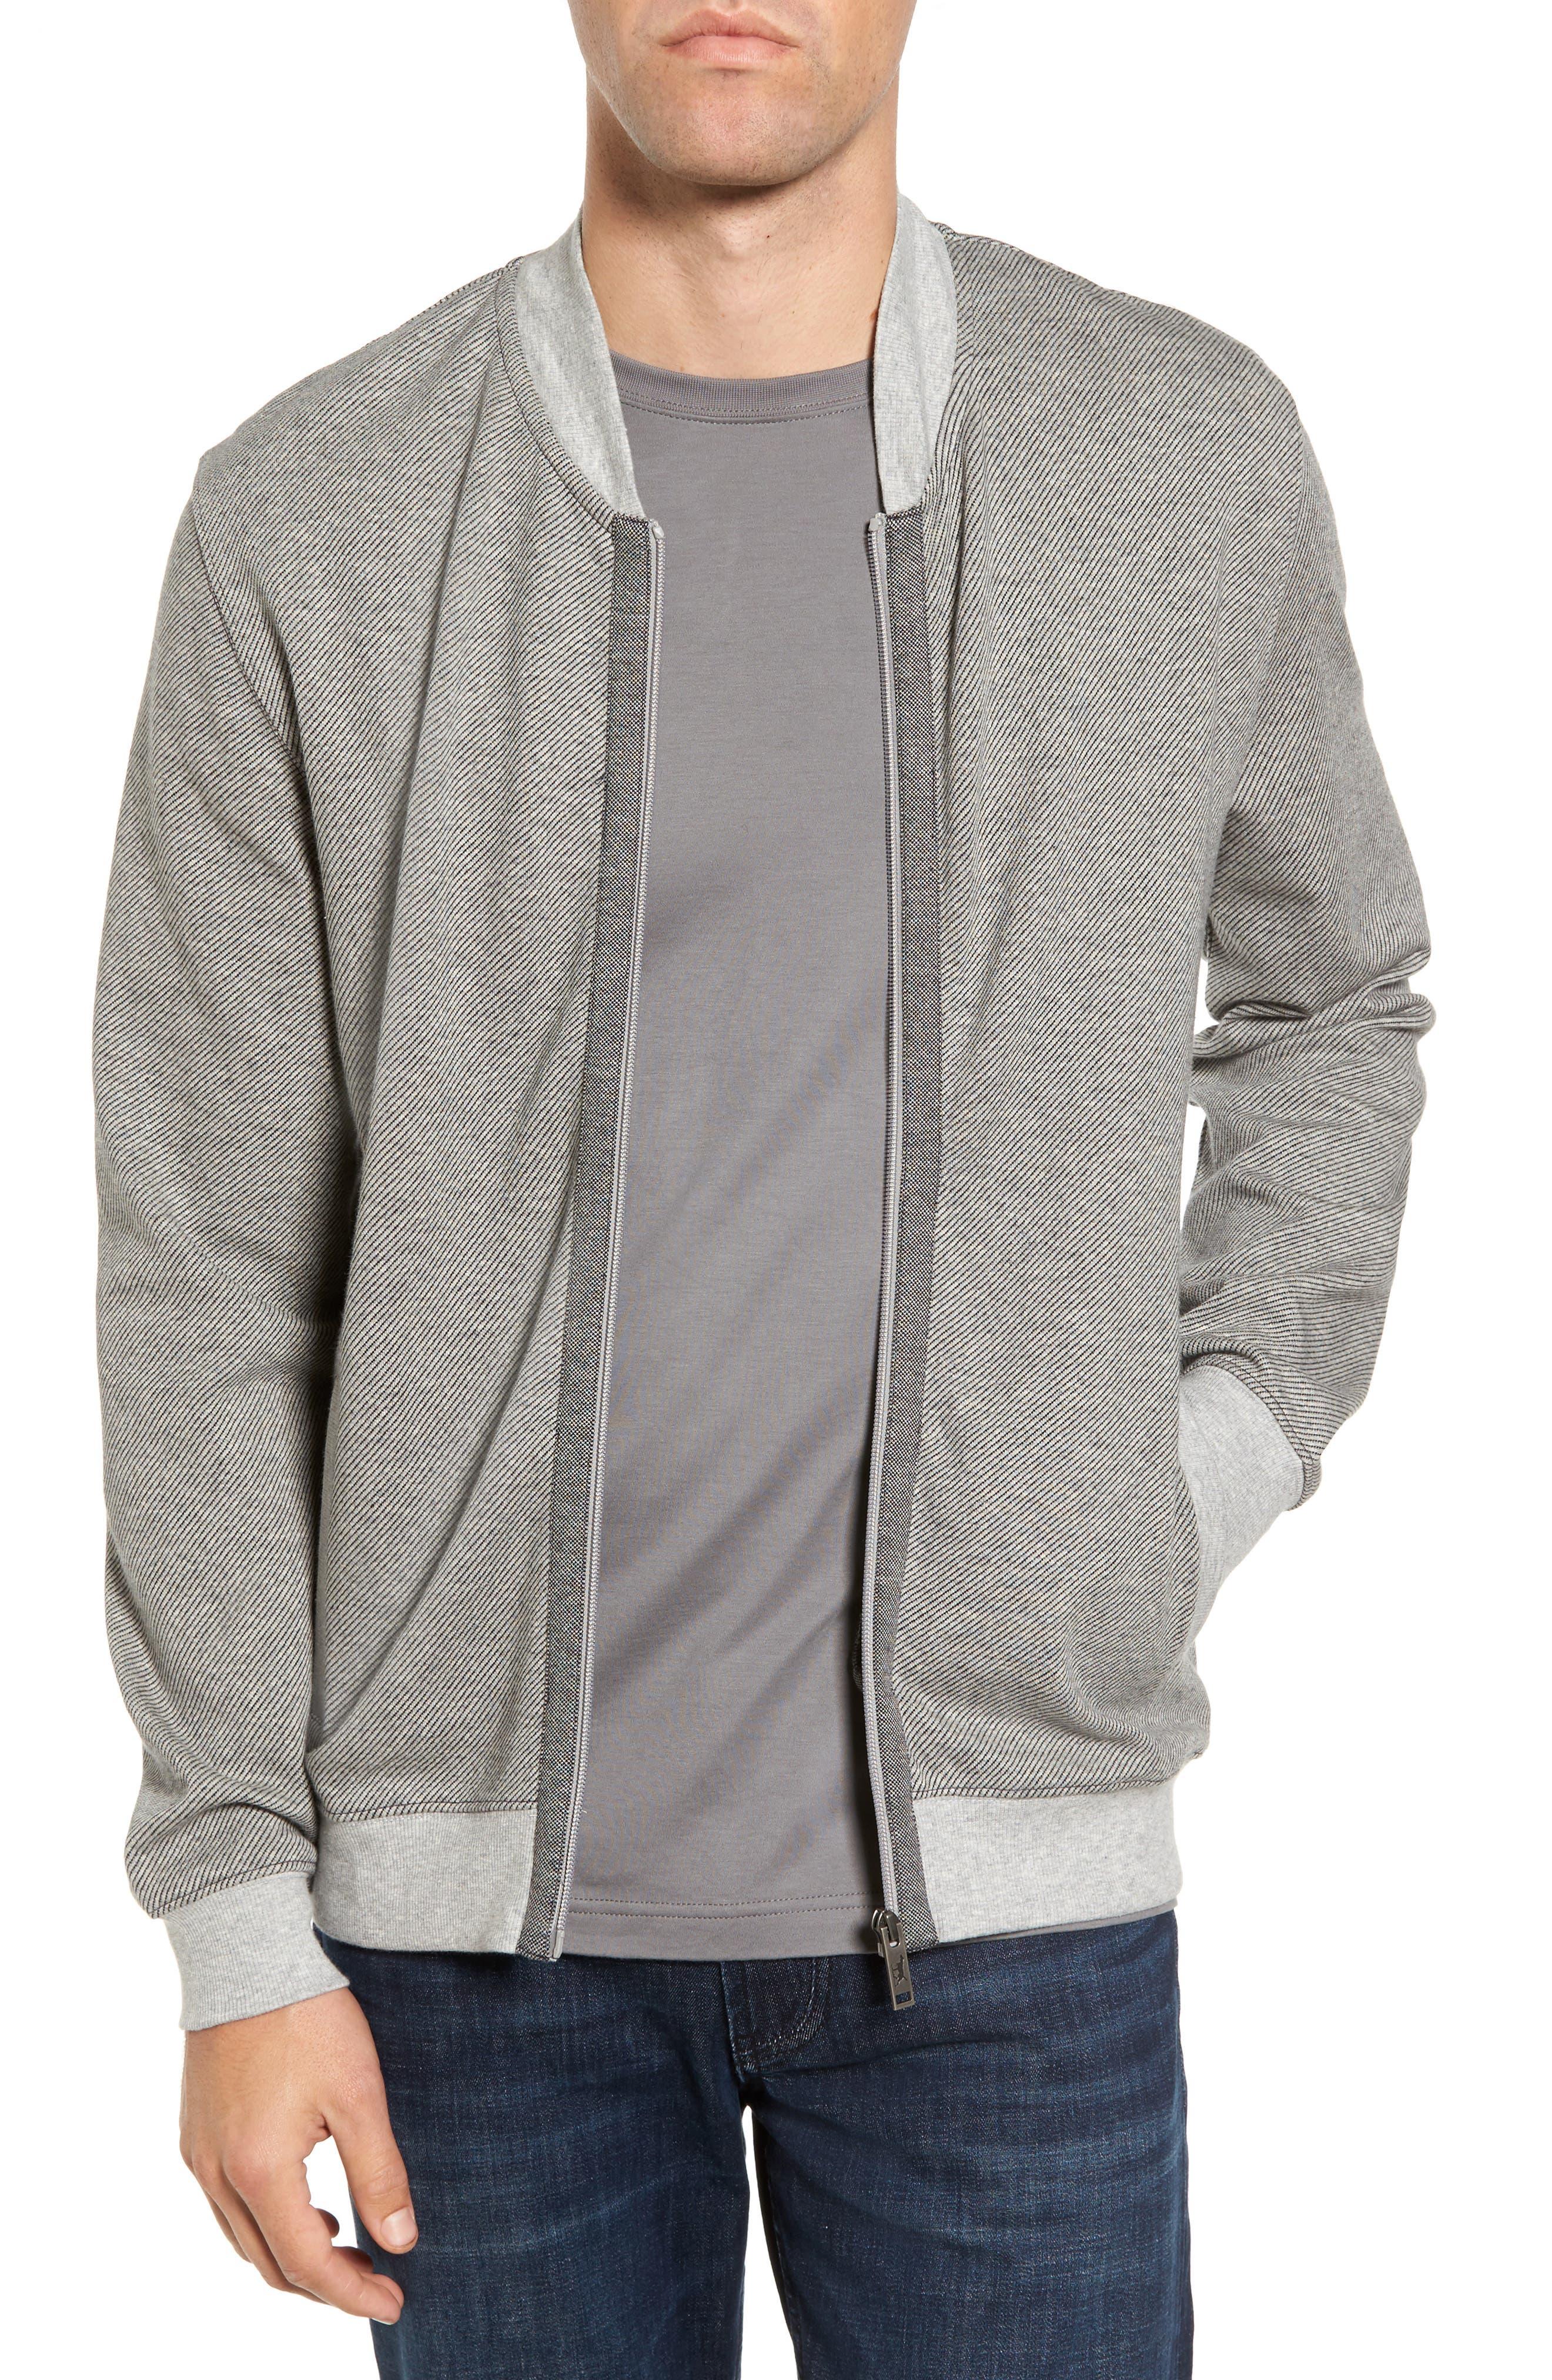 Alderson Ave Fleece Jacket,                         Main,                         color, 020